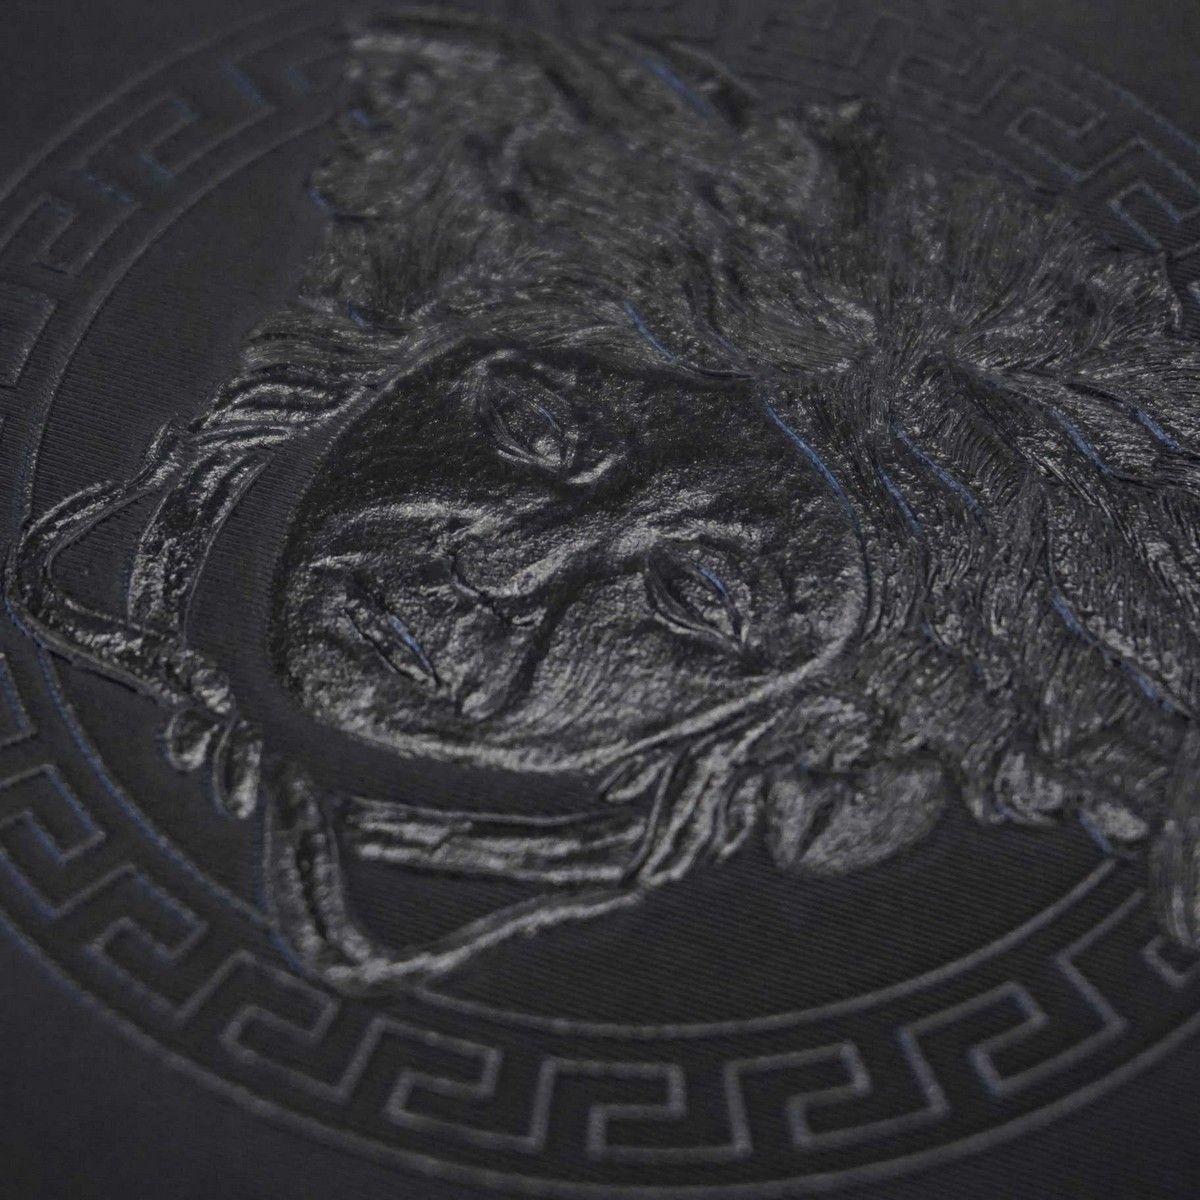 Versace Home Medusa Royale Black Luxury 70cm Wallpaper By As Creation 34862 2 Black Luxury Versace Home Versace